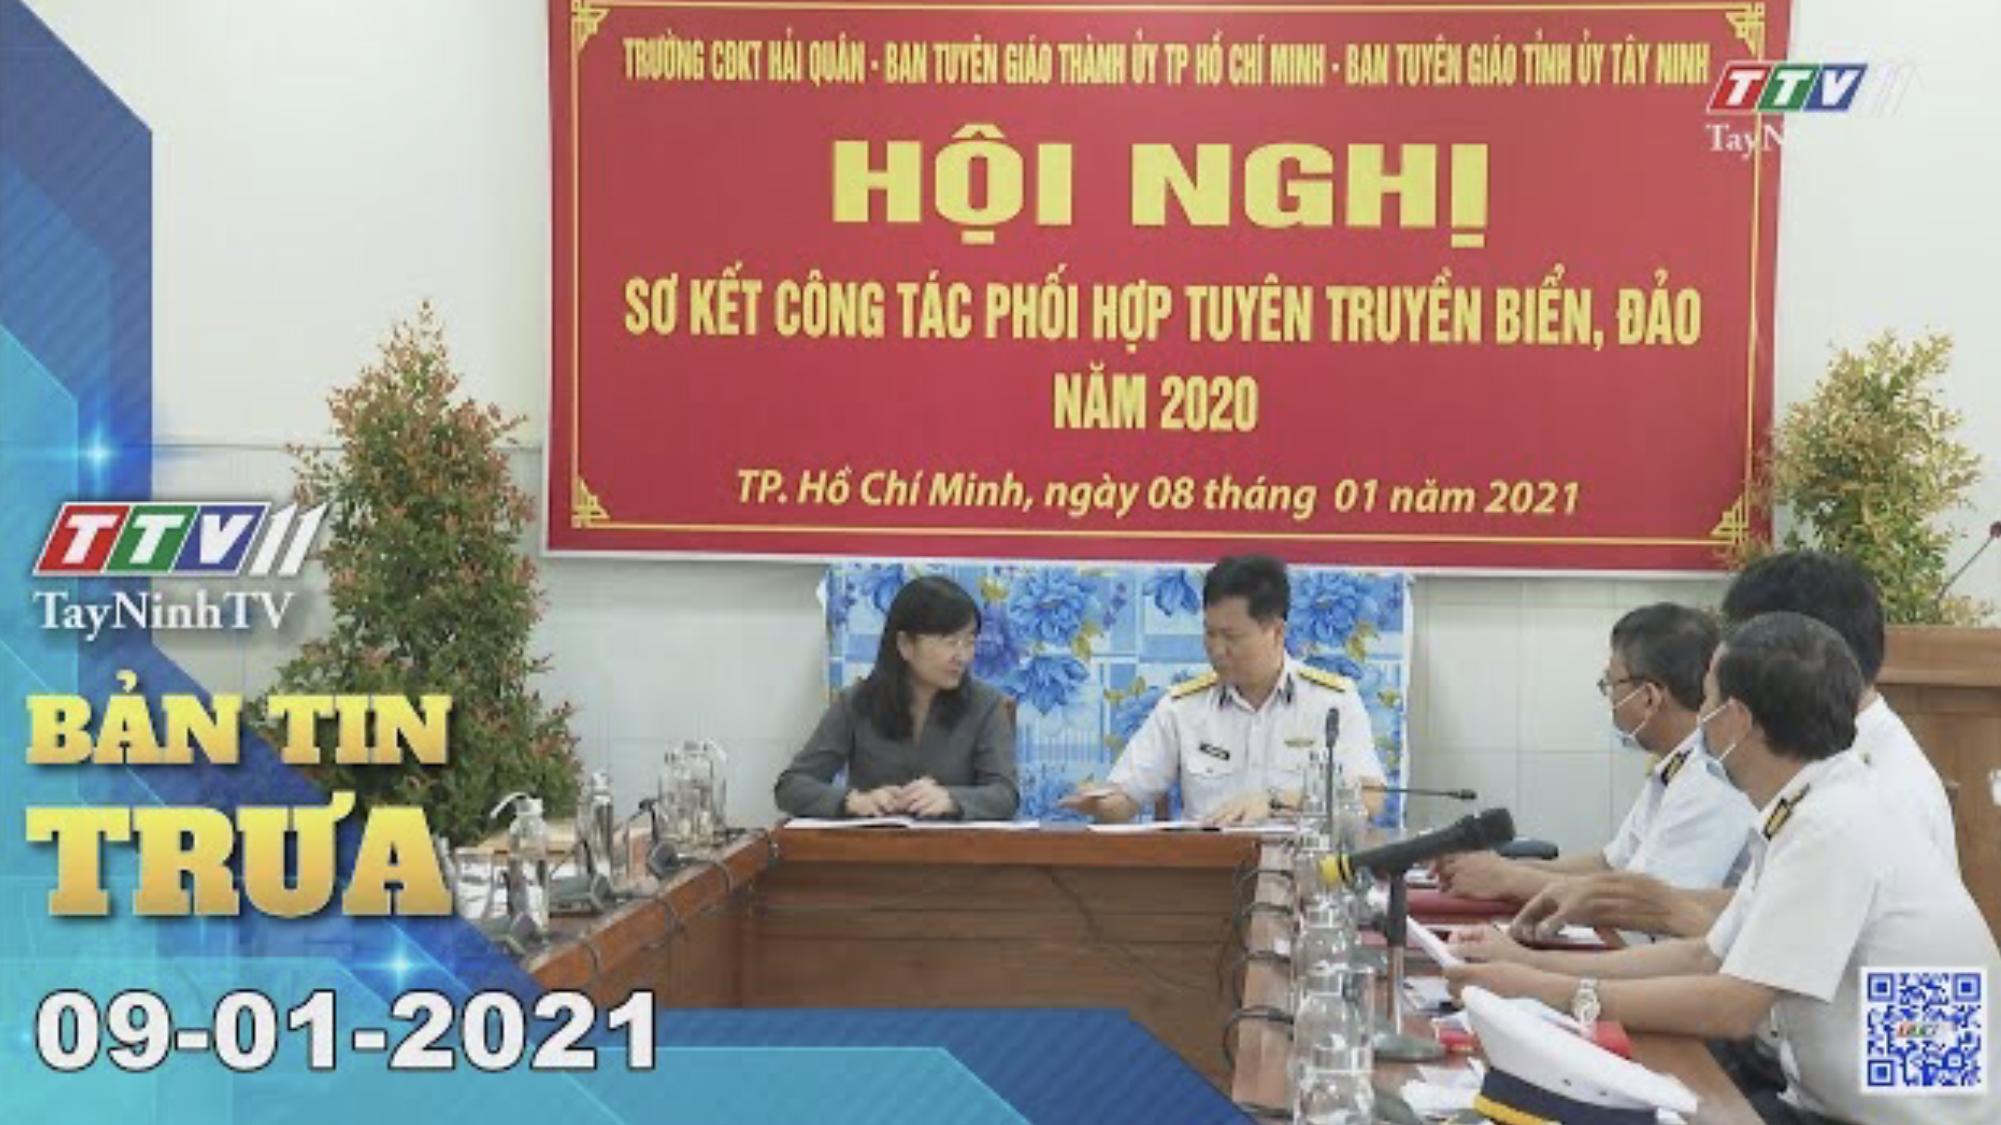 Bản tin trưa 09-01-2021 | Tin tức hôm nay | TayNinhTV